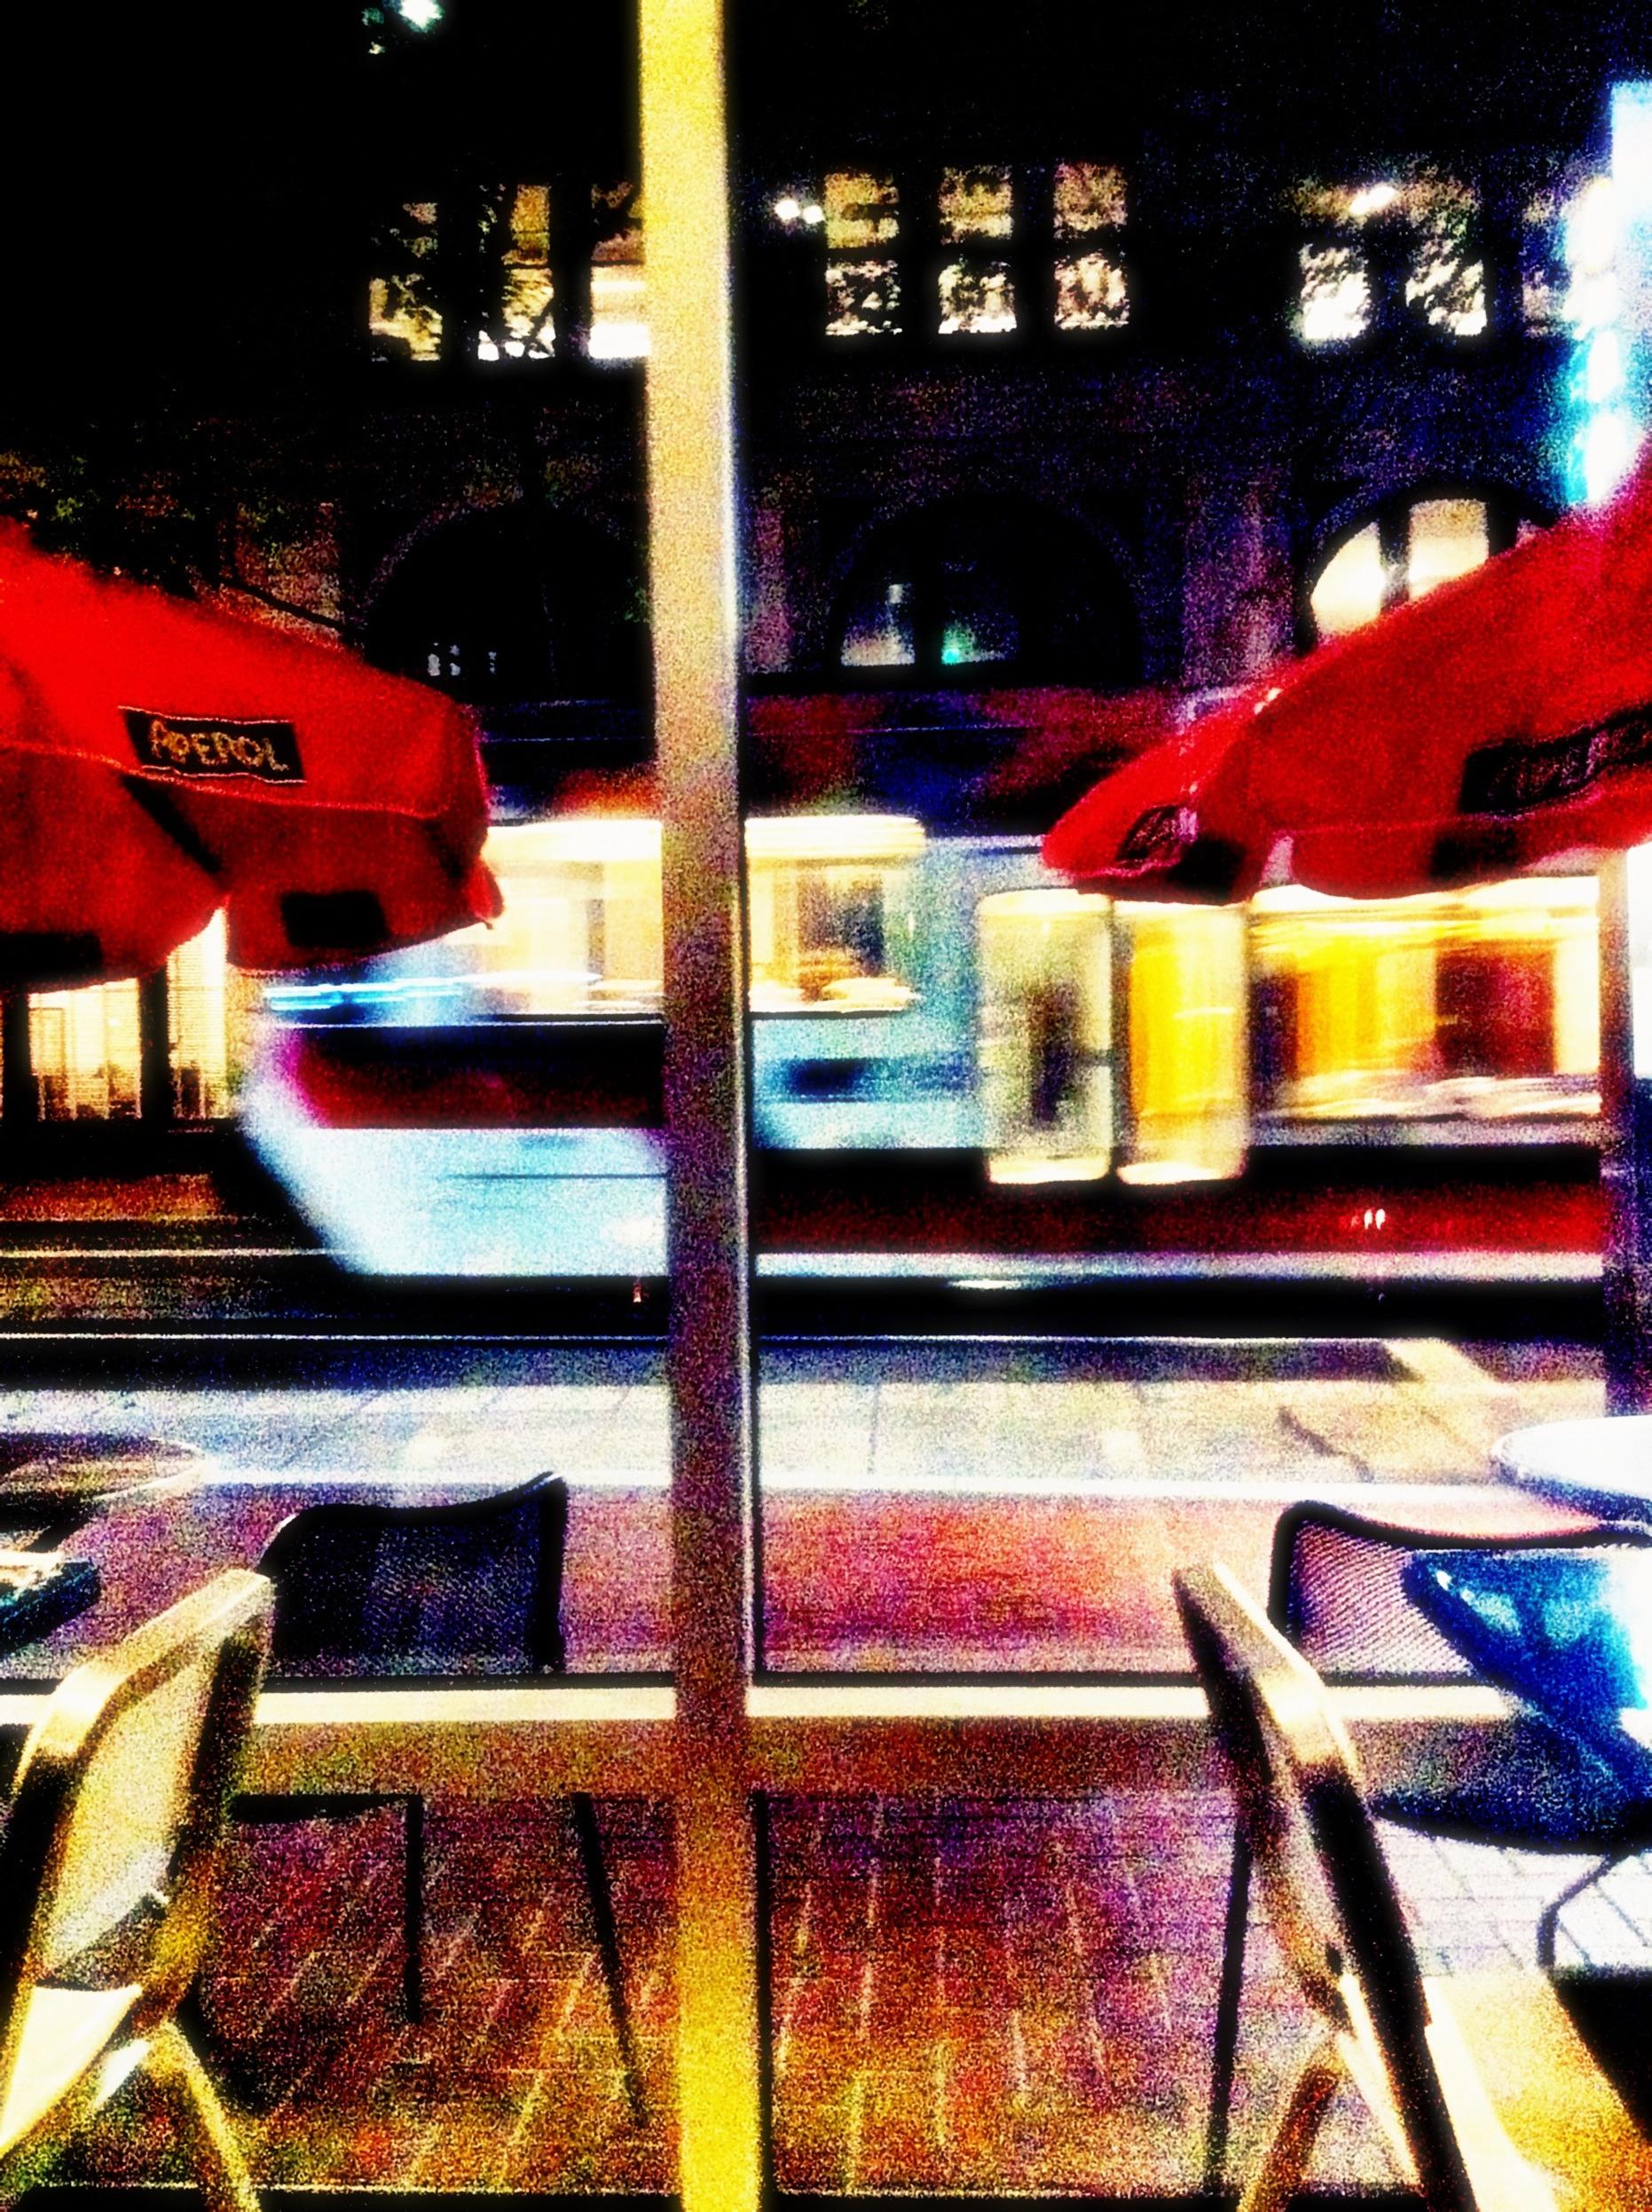 portland night tram